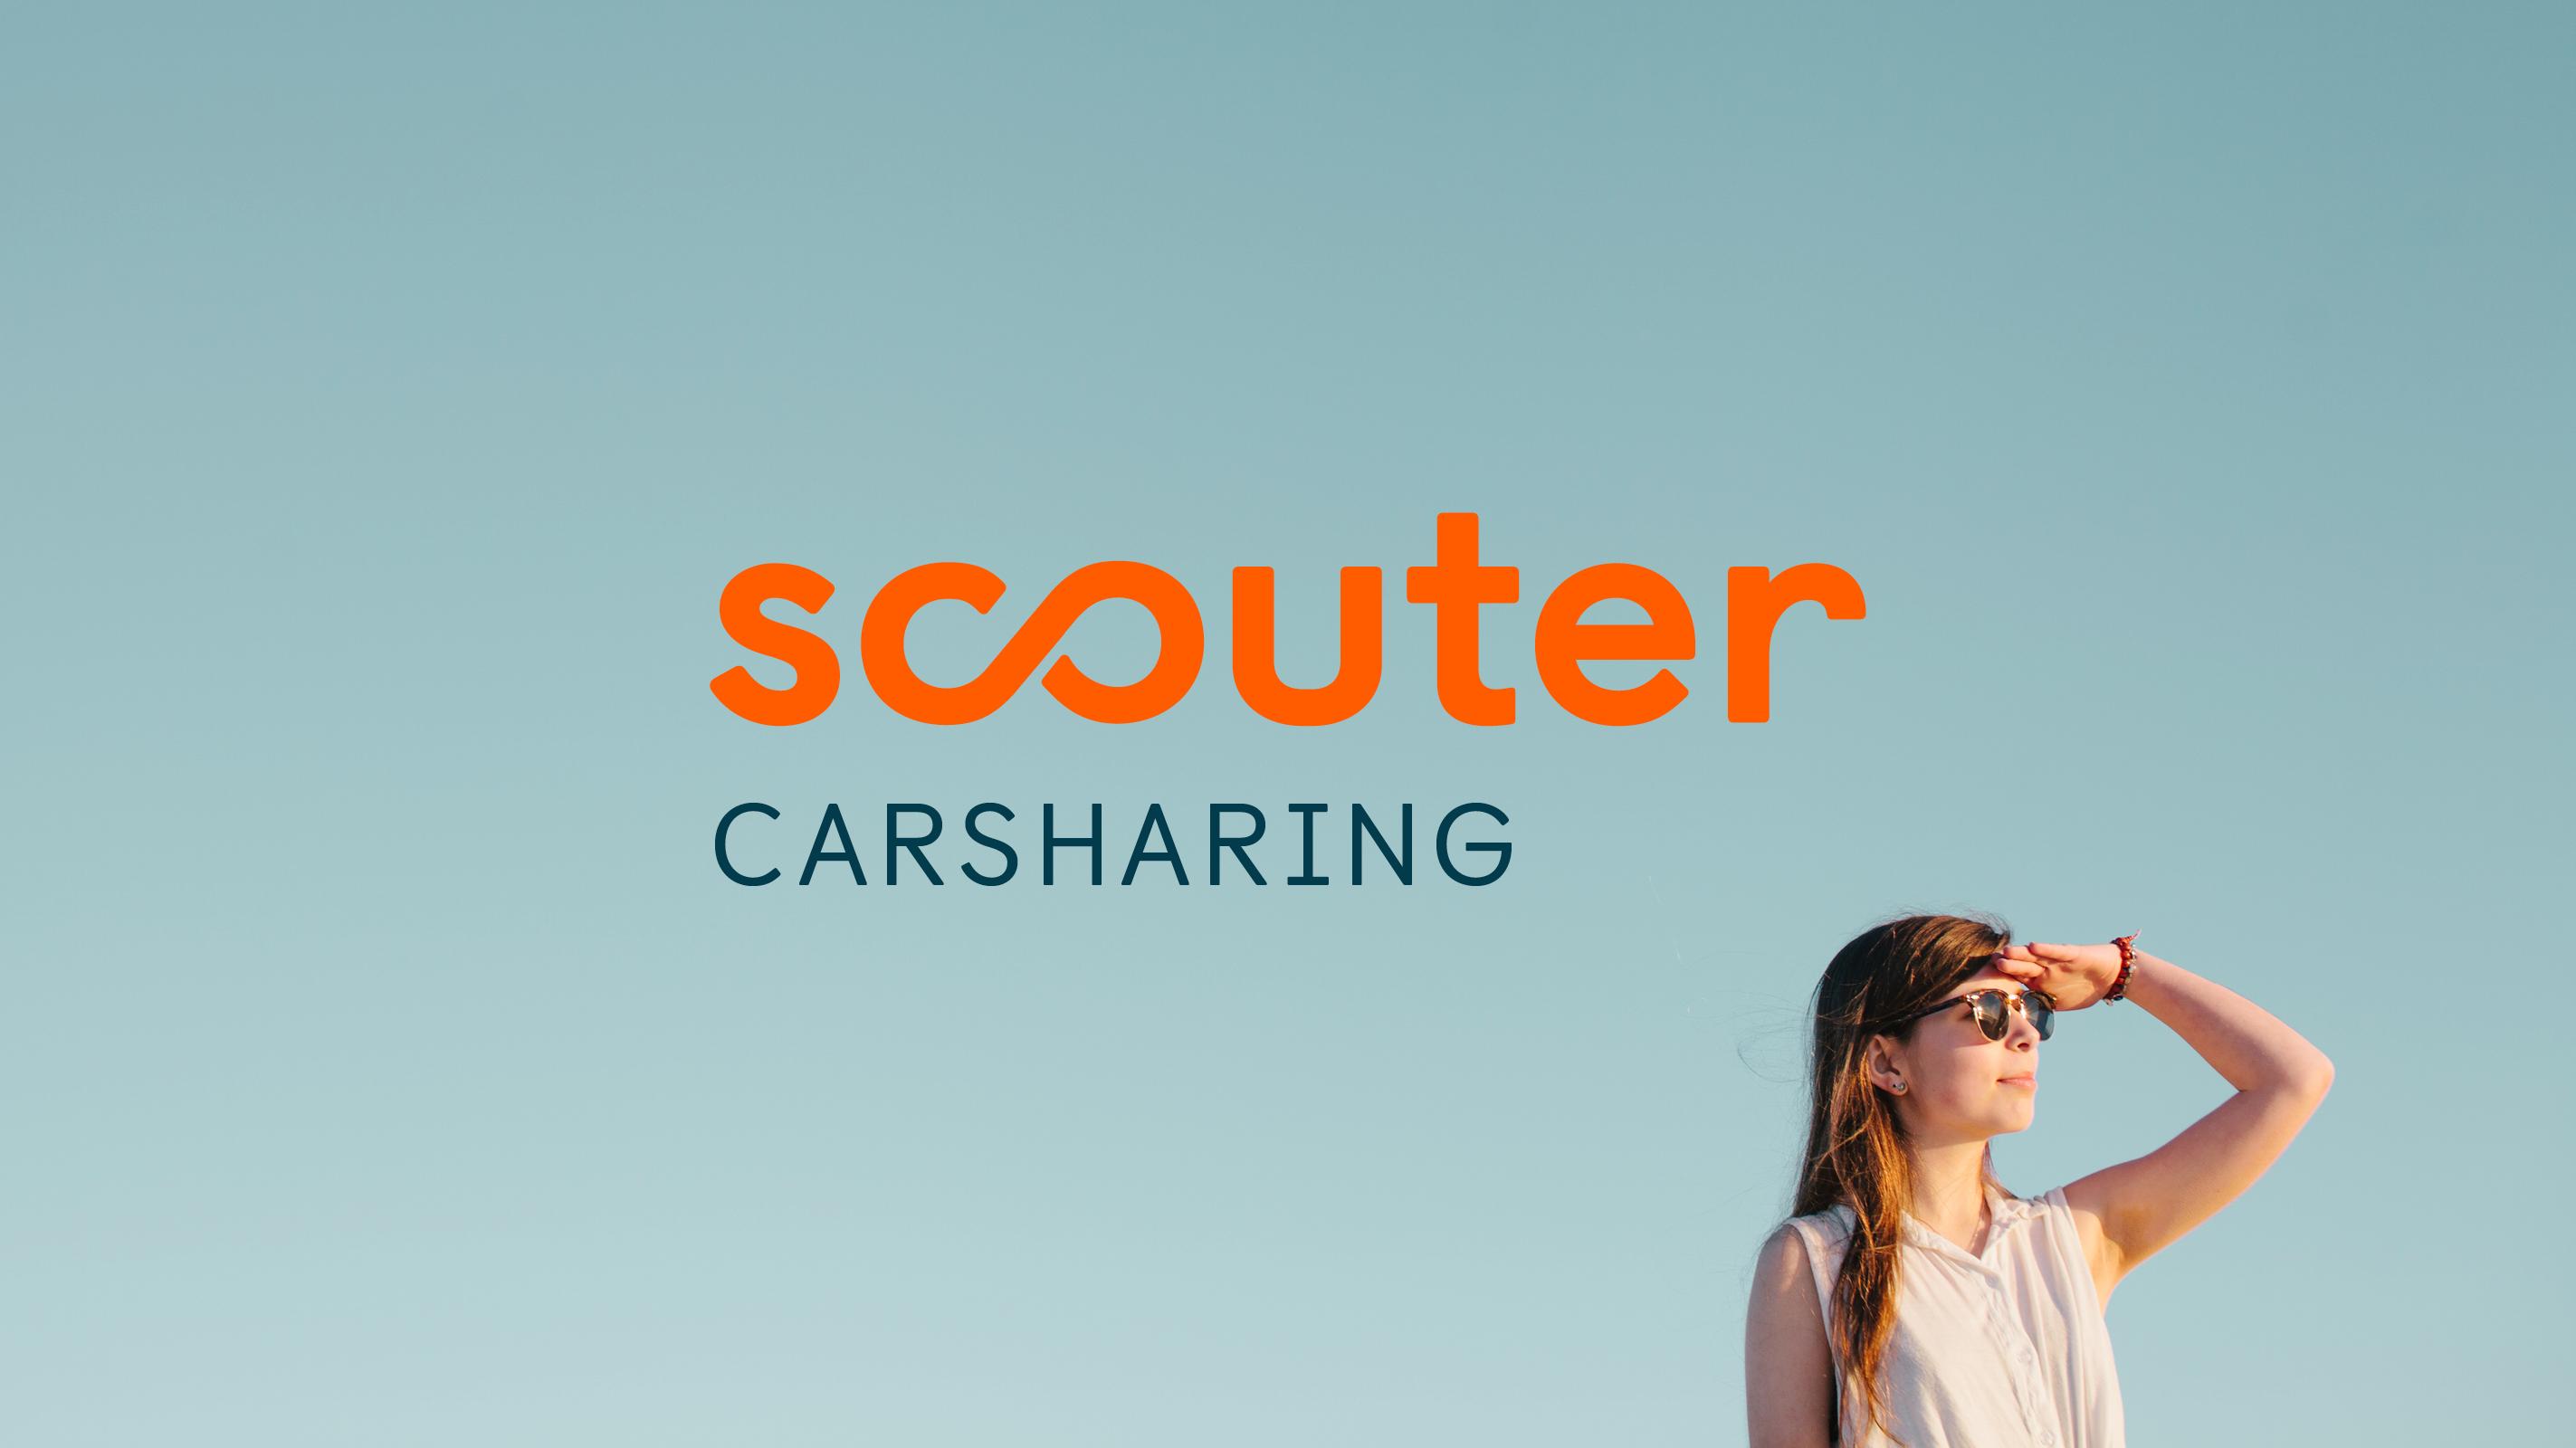 Scouter Carsharing – Poarangan Brand Design